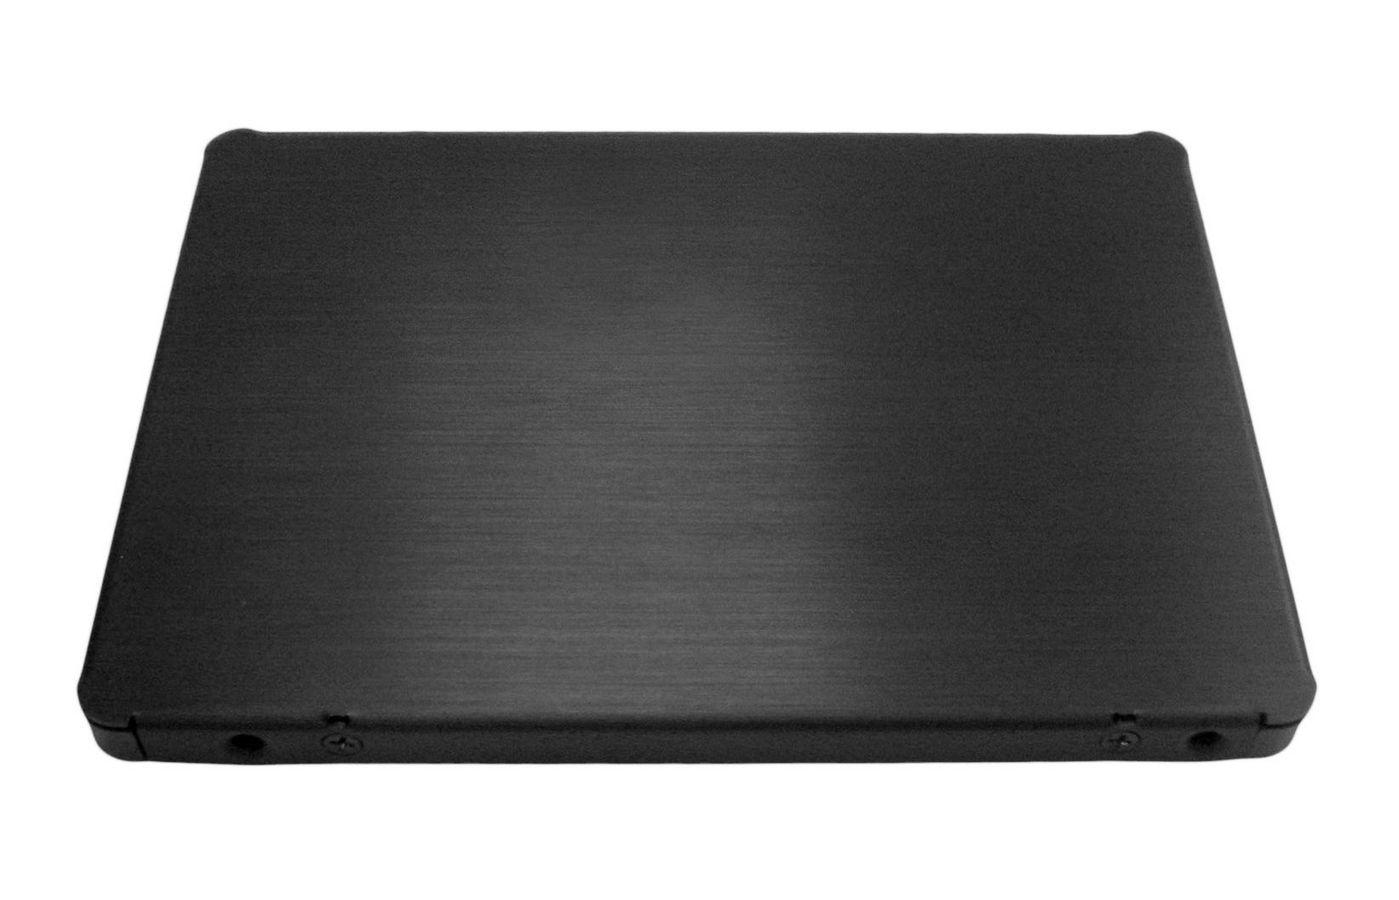 CoreParts MS-SSD-SATAIII-120GB 2.5 SATA III 120GB SSD 7mm